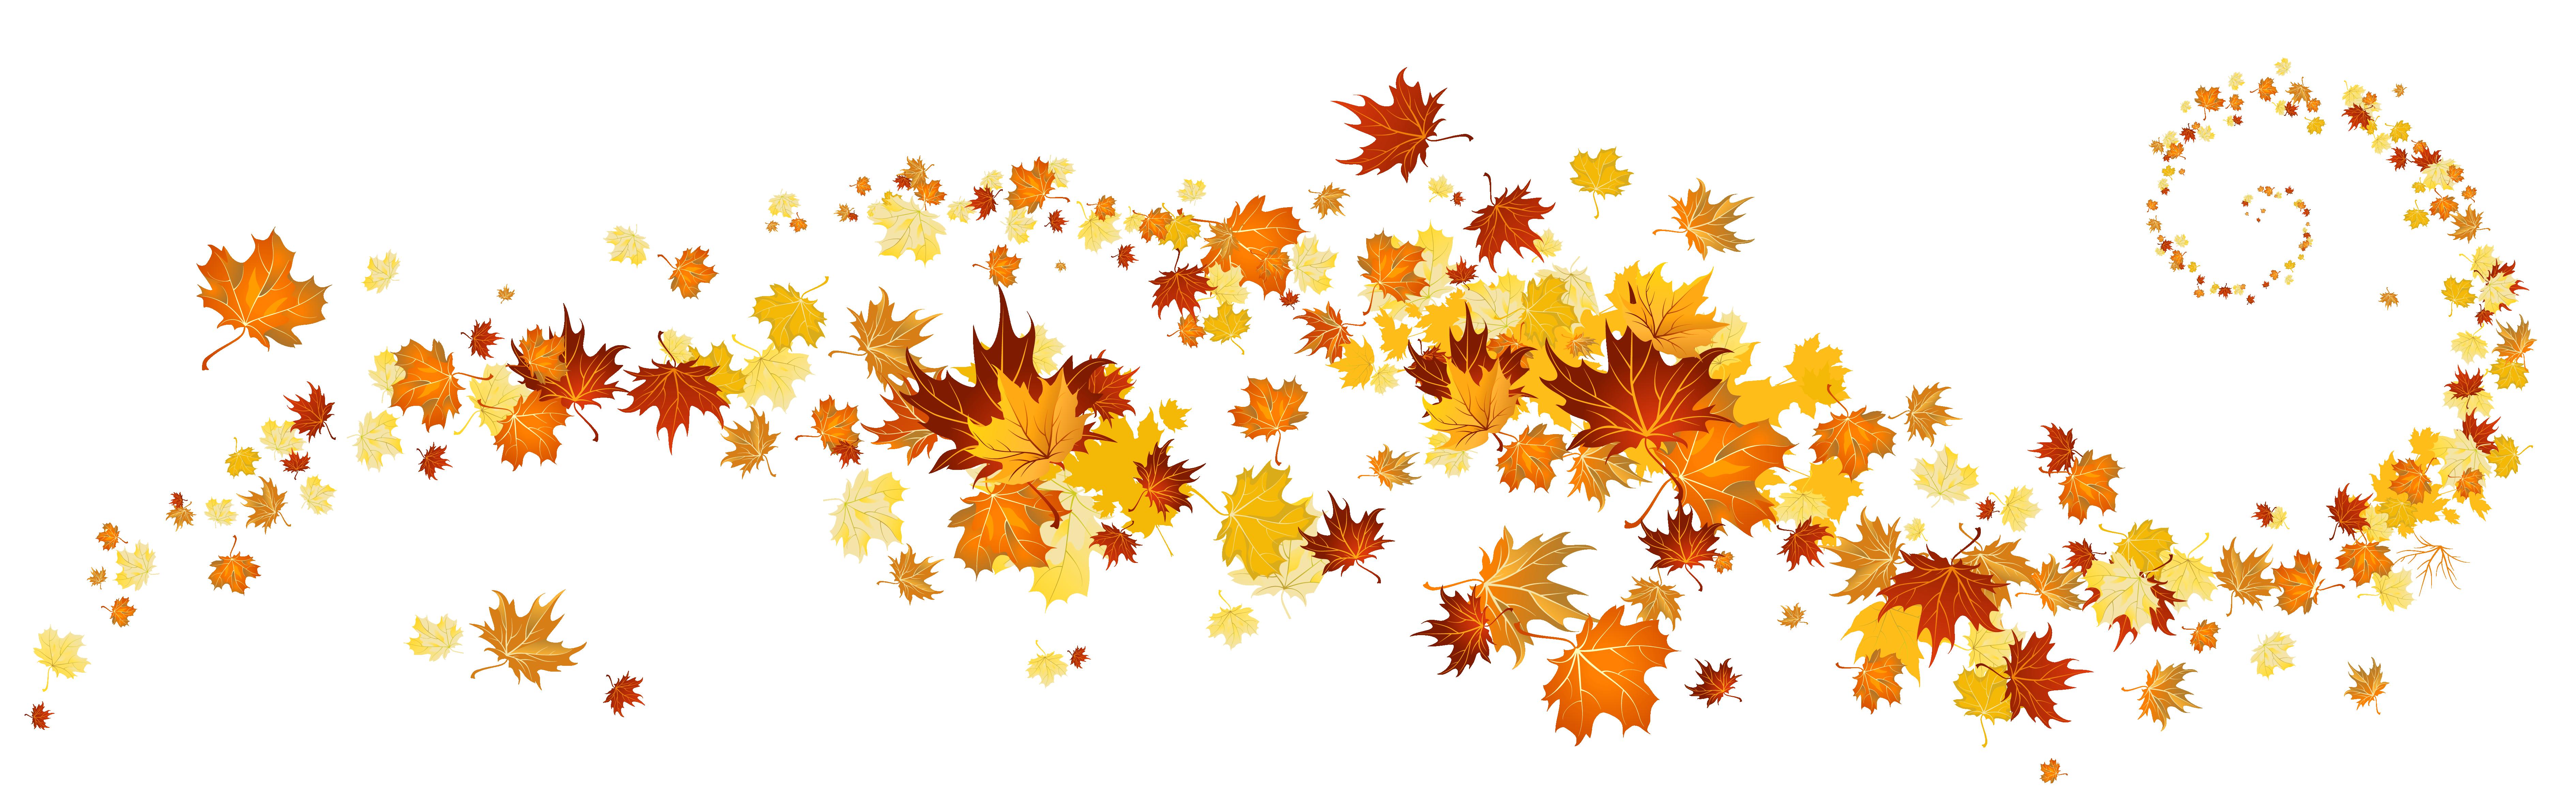 Leaf clipart fall - .-Leaf clipart fall - .-10